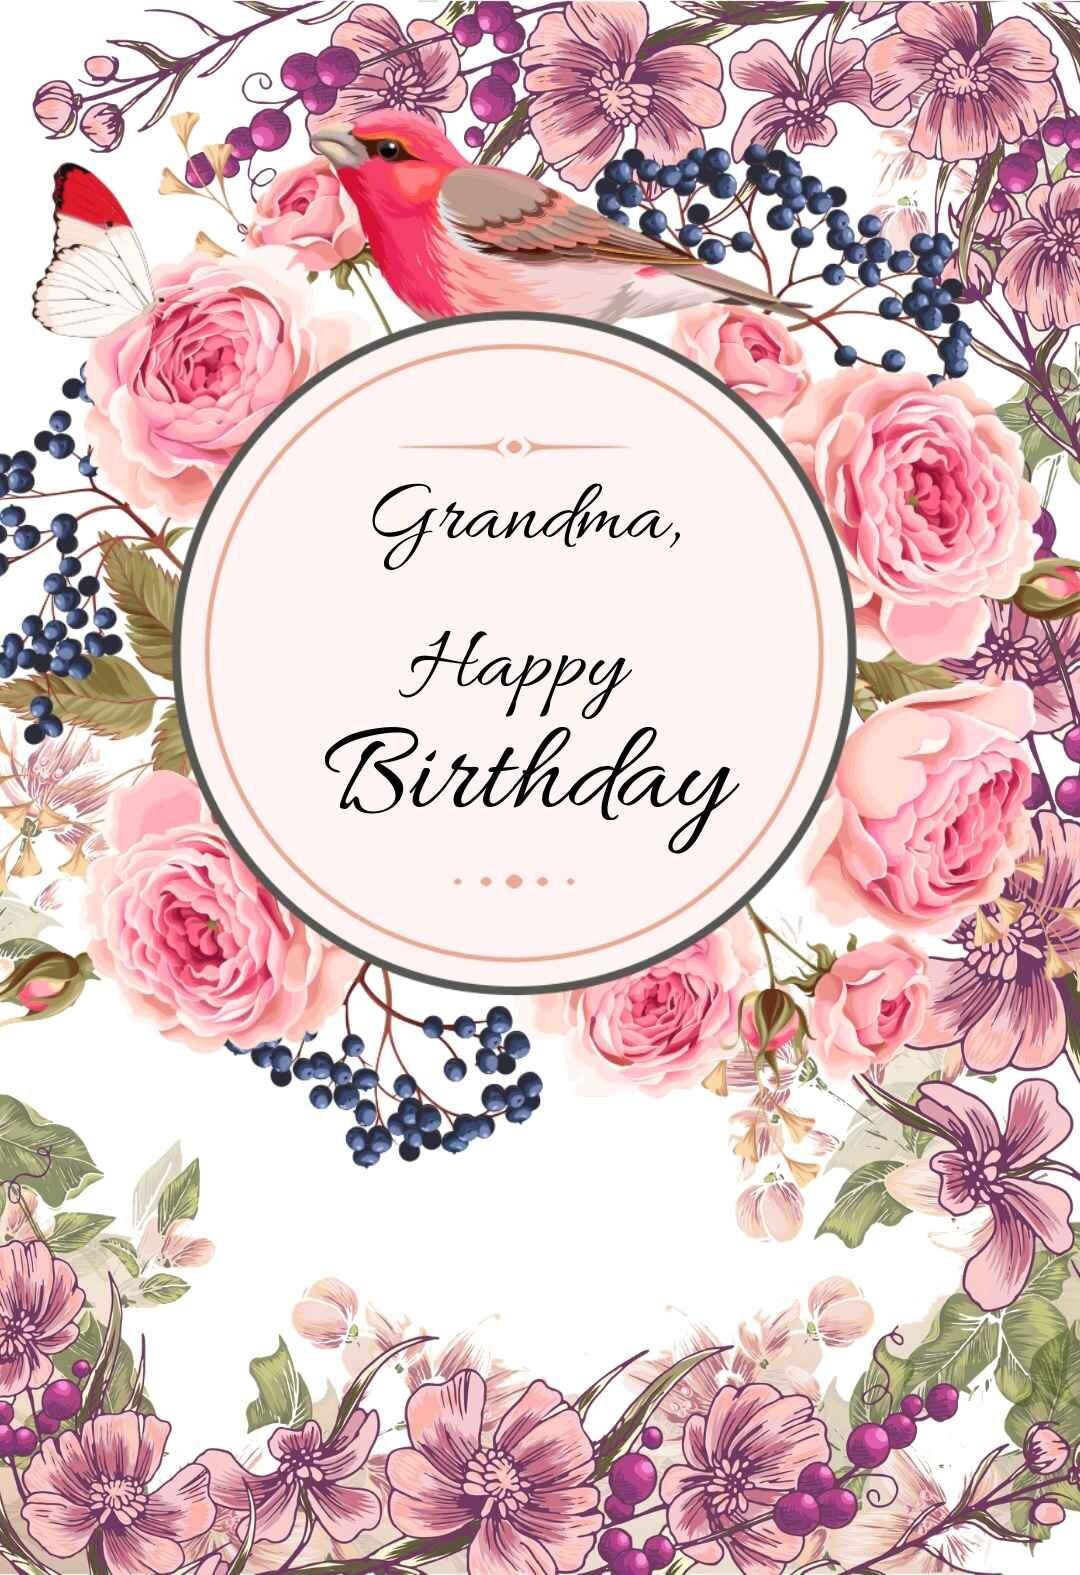 Happy Birthday Grandma Printable Card : happy, birthday, grandma, printable, Grandma, Printable, Birthday, Cards, PRINTBIRTHDAY.CARDS